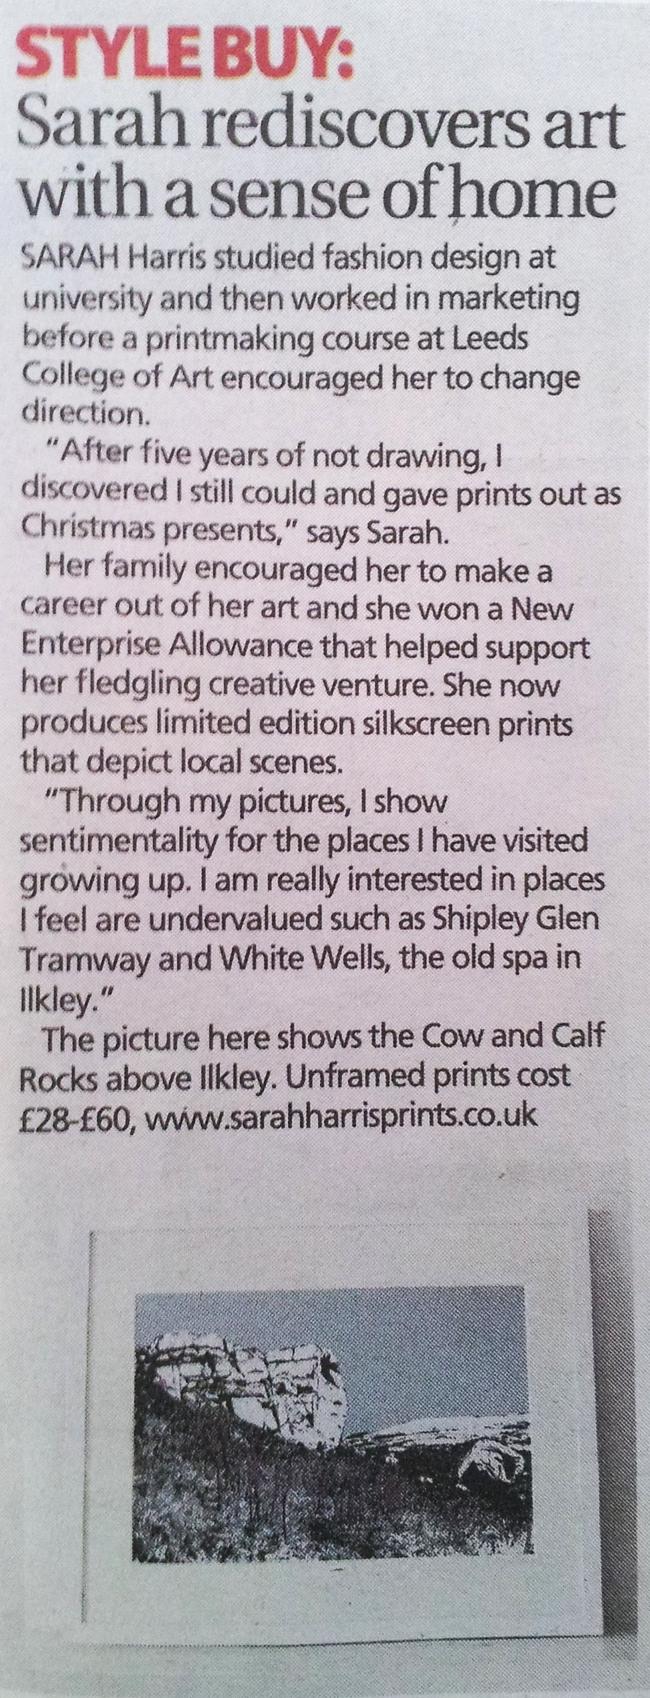 Yorkshire Post (13.04.2013)